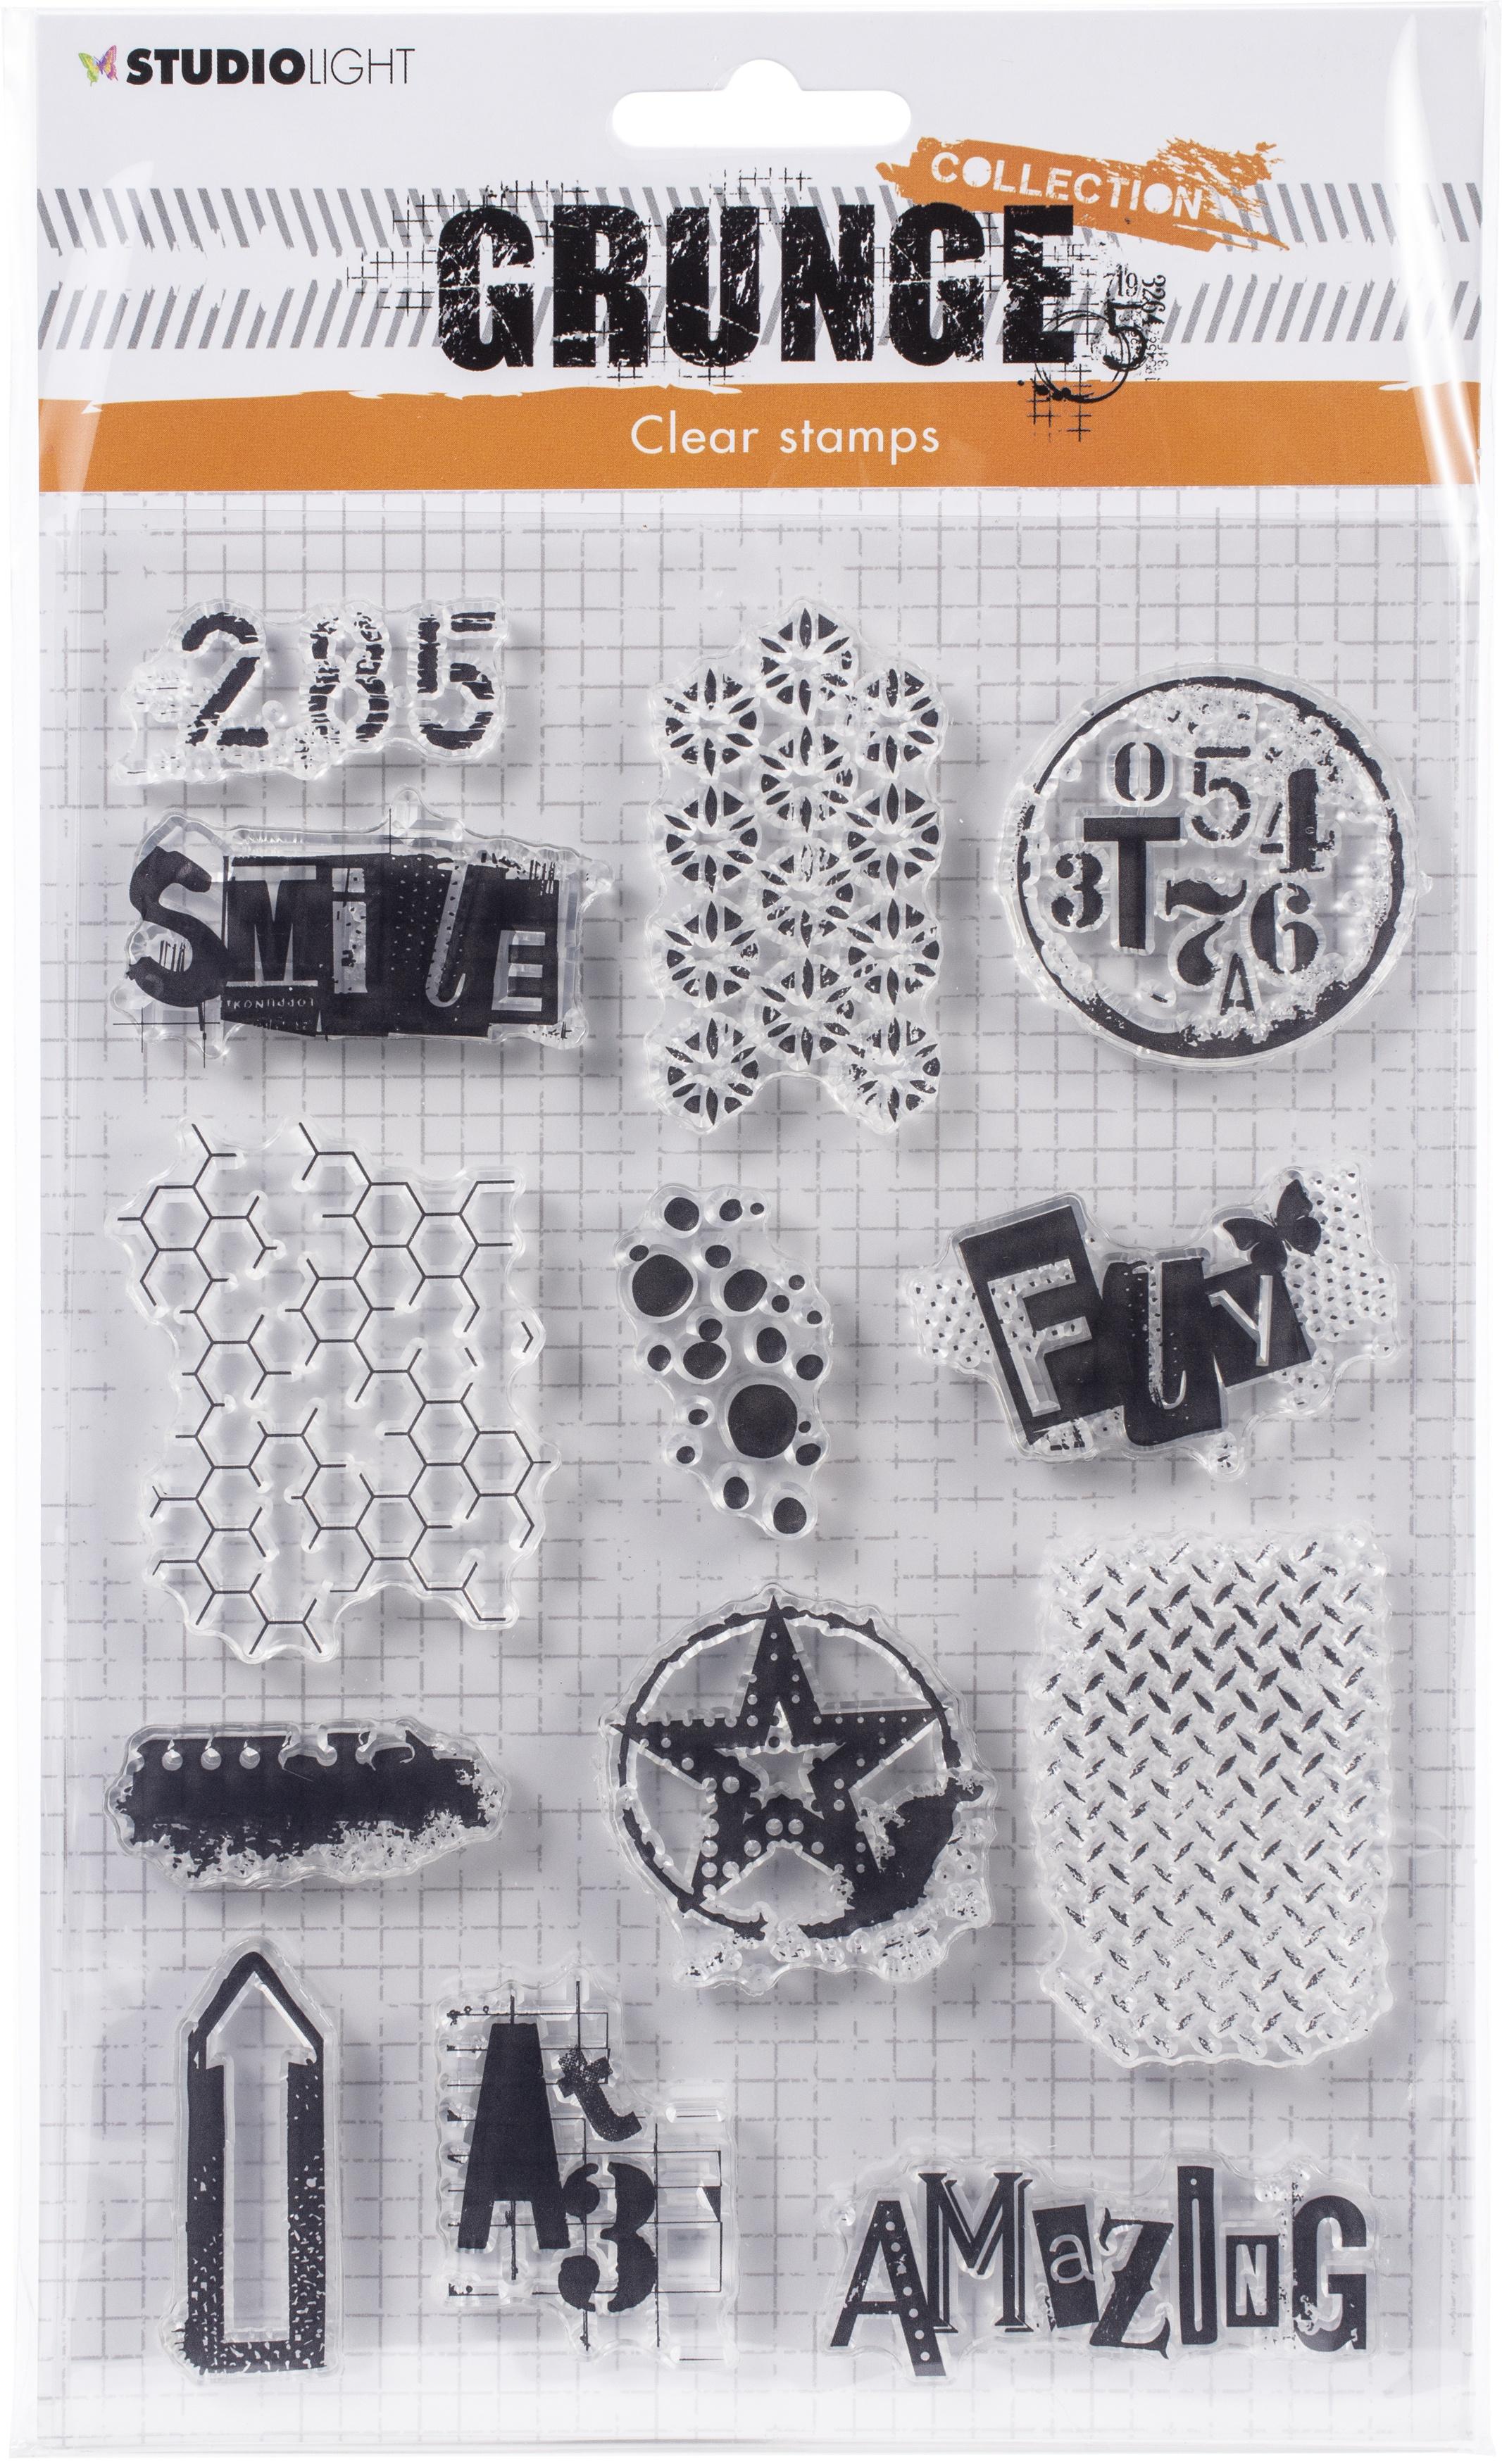 Studio Light Grunge 3.0 Collection A5 Stamp-NR. 408